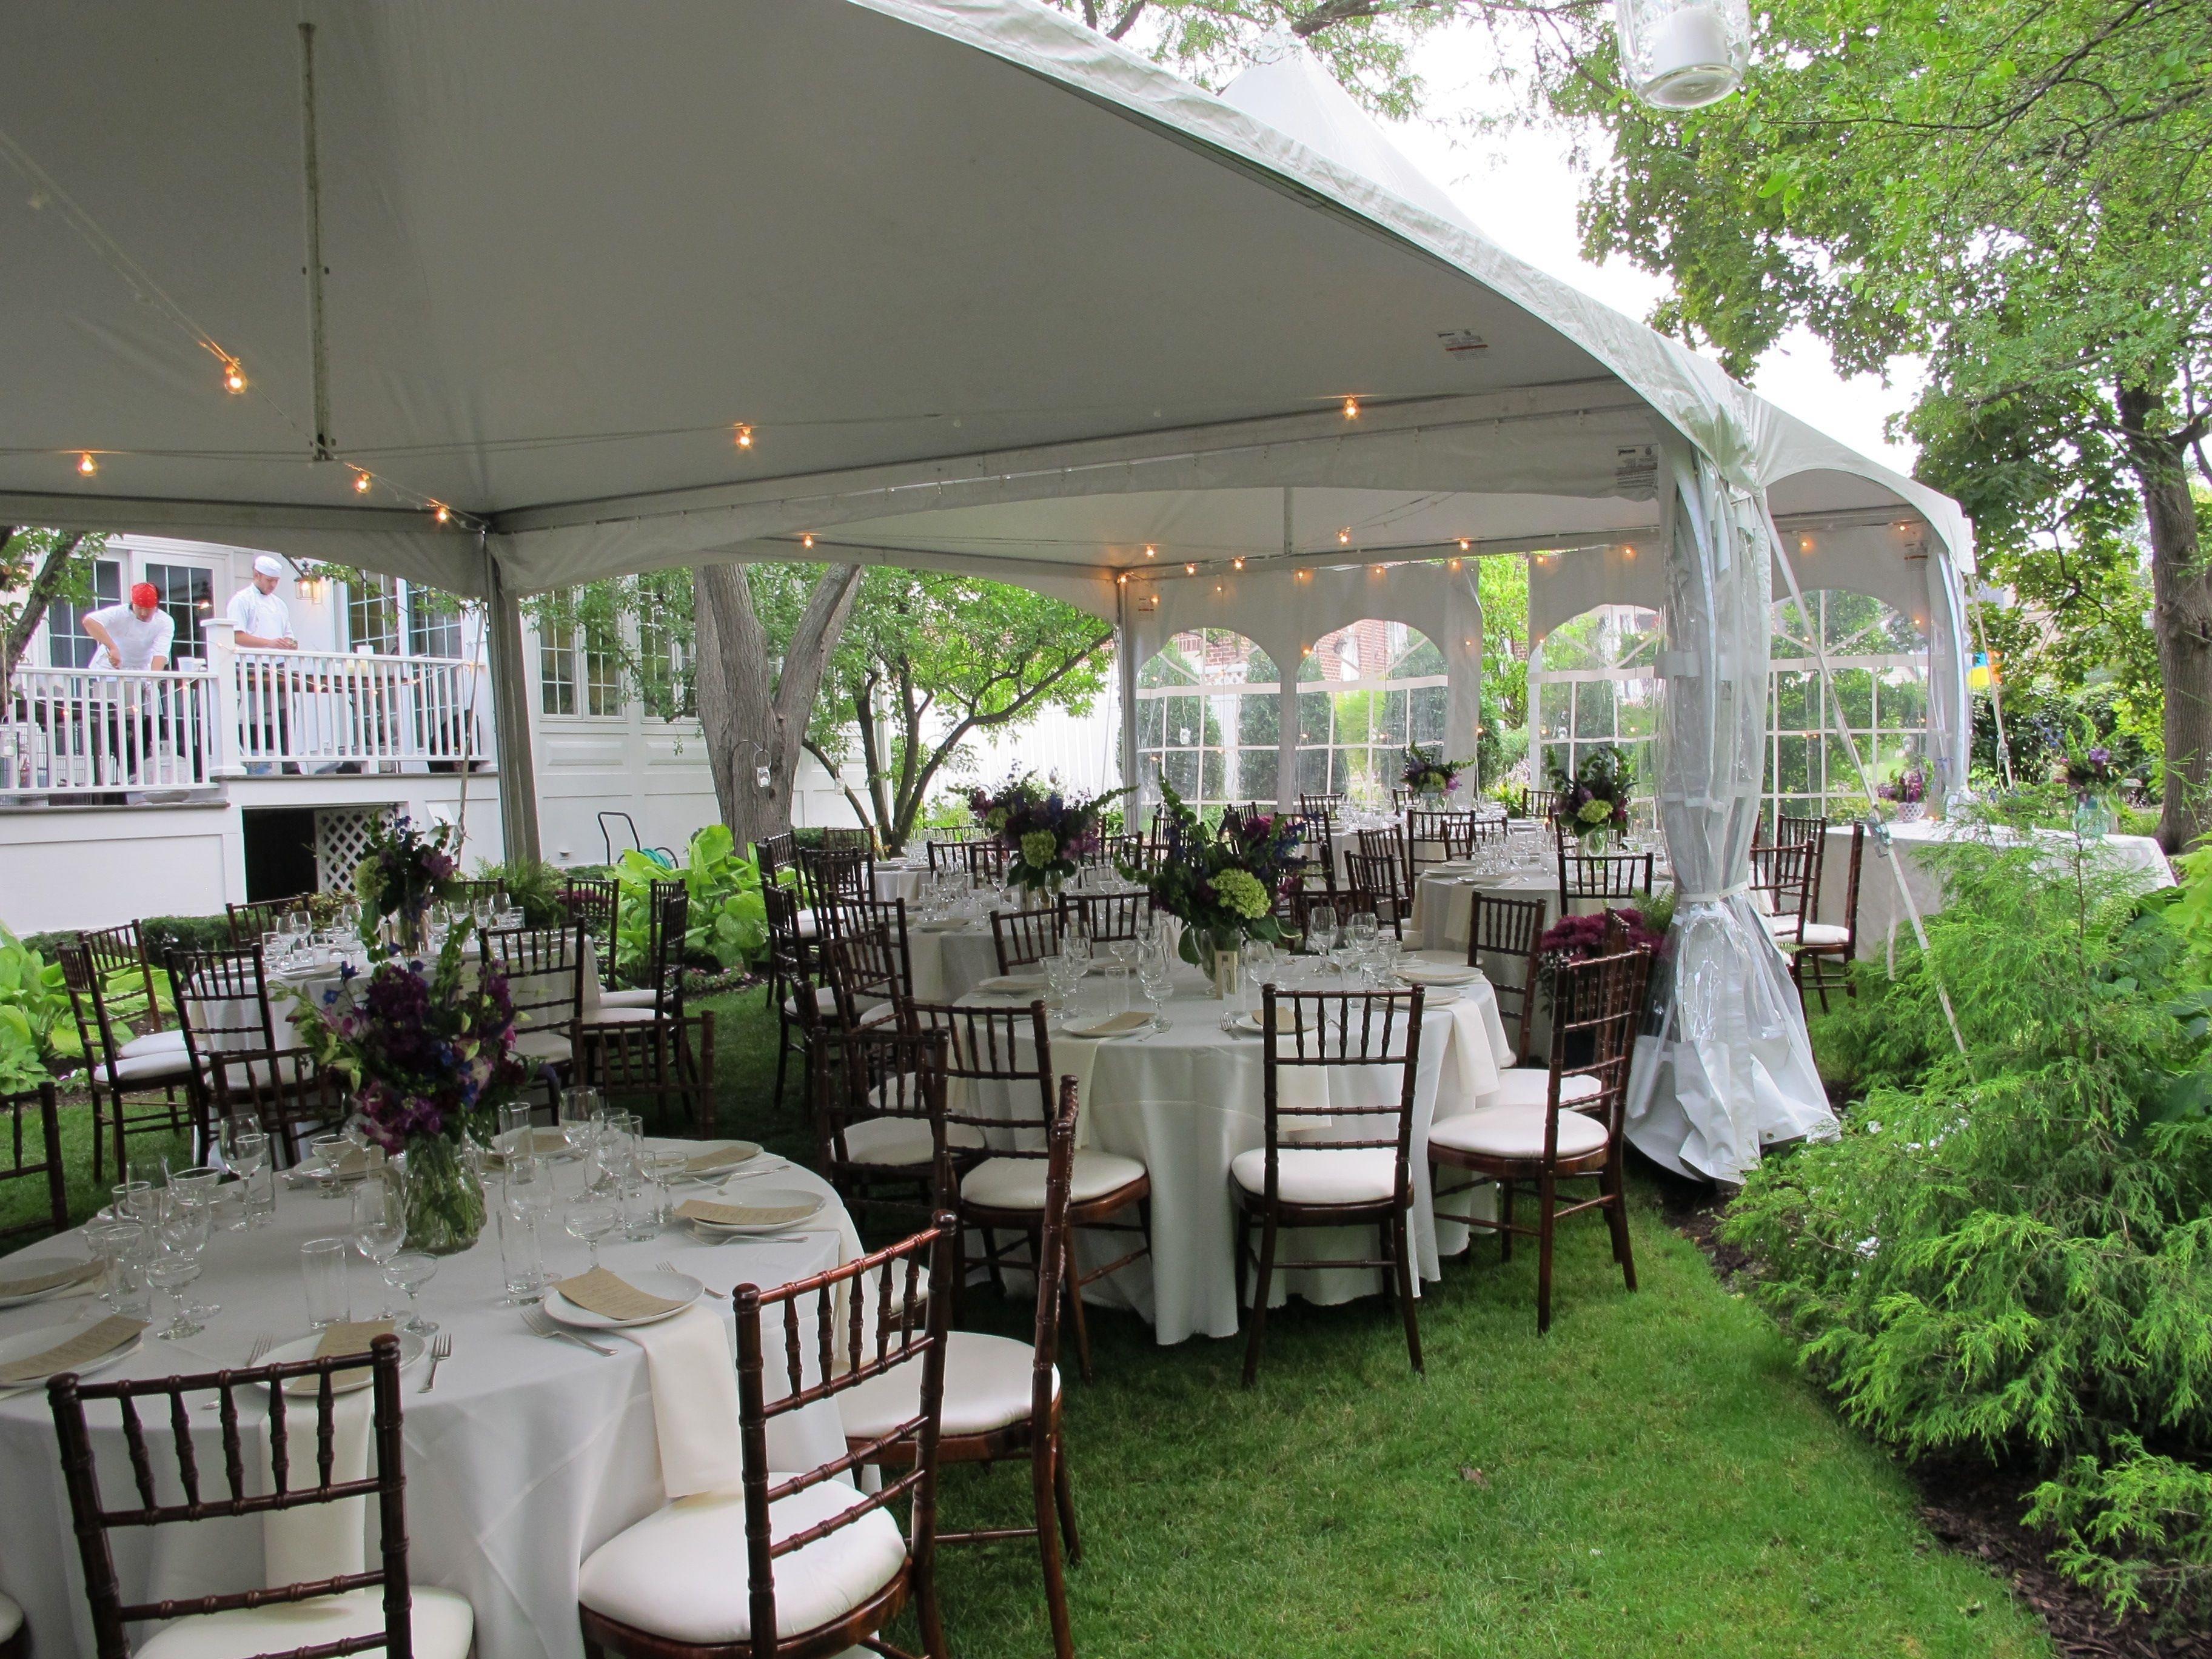 10 Unique Small Backyard Wedding Reception Ideas backyard wedding reception ideas elegant best 25 small backyard 2020